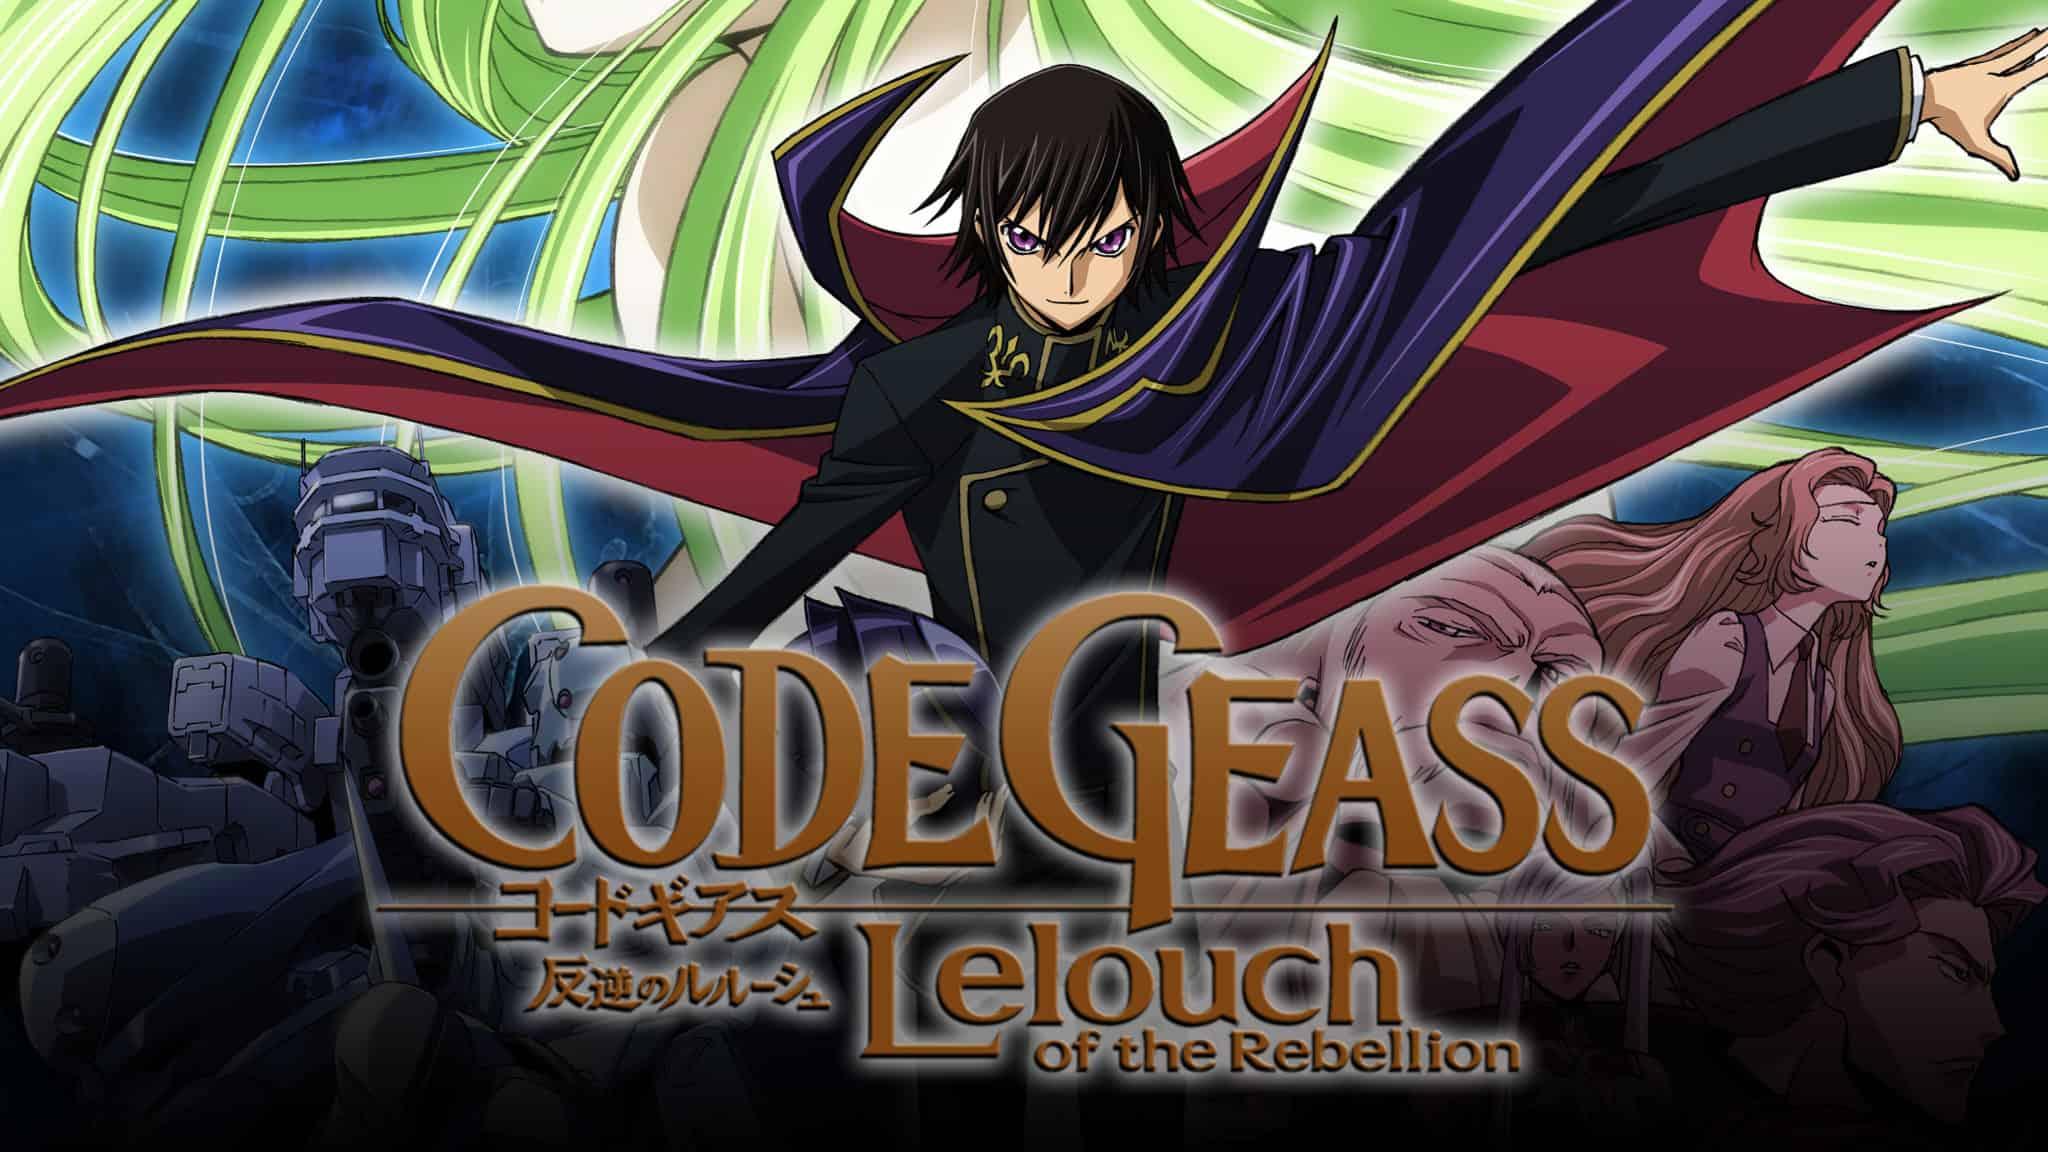 Code Geass Season 3- The Release Date & Every Information - 1st Slice